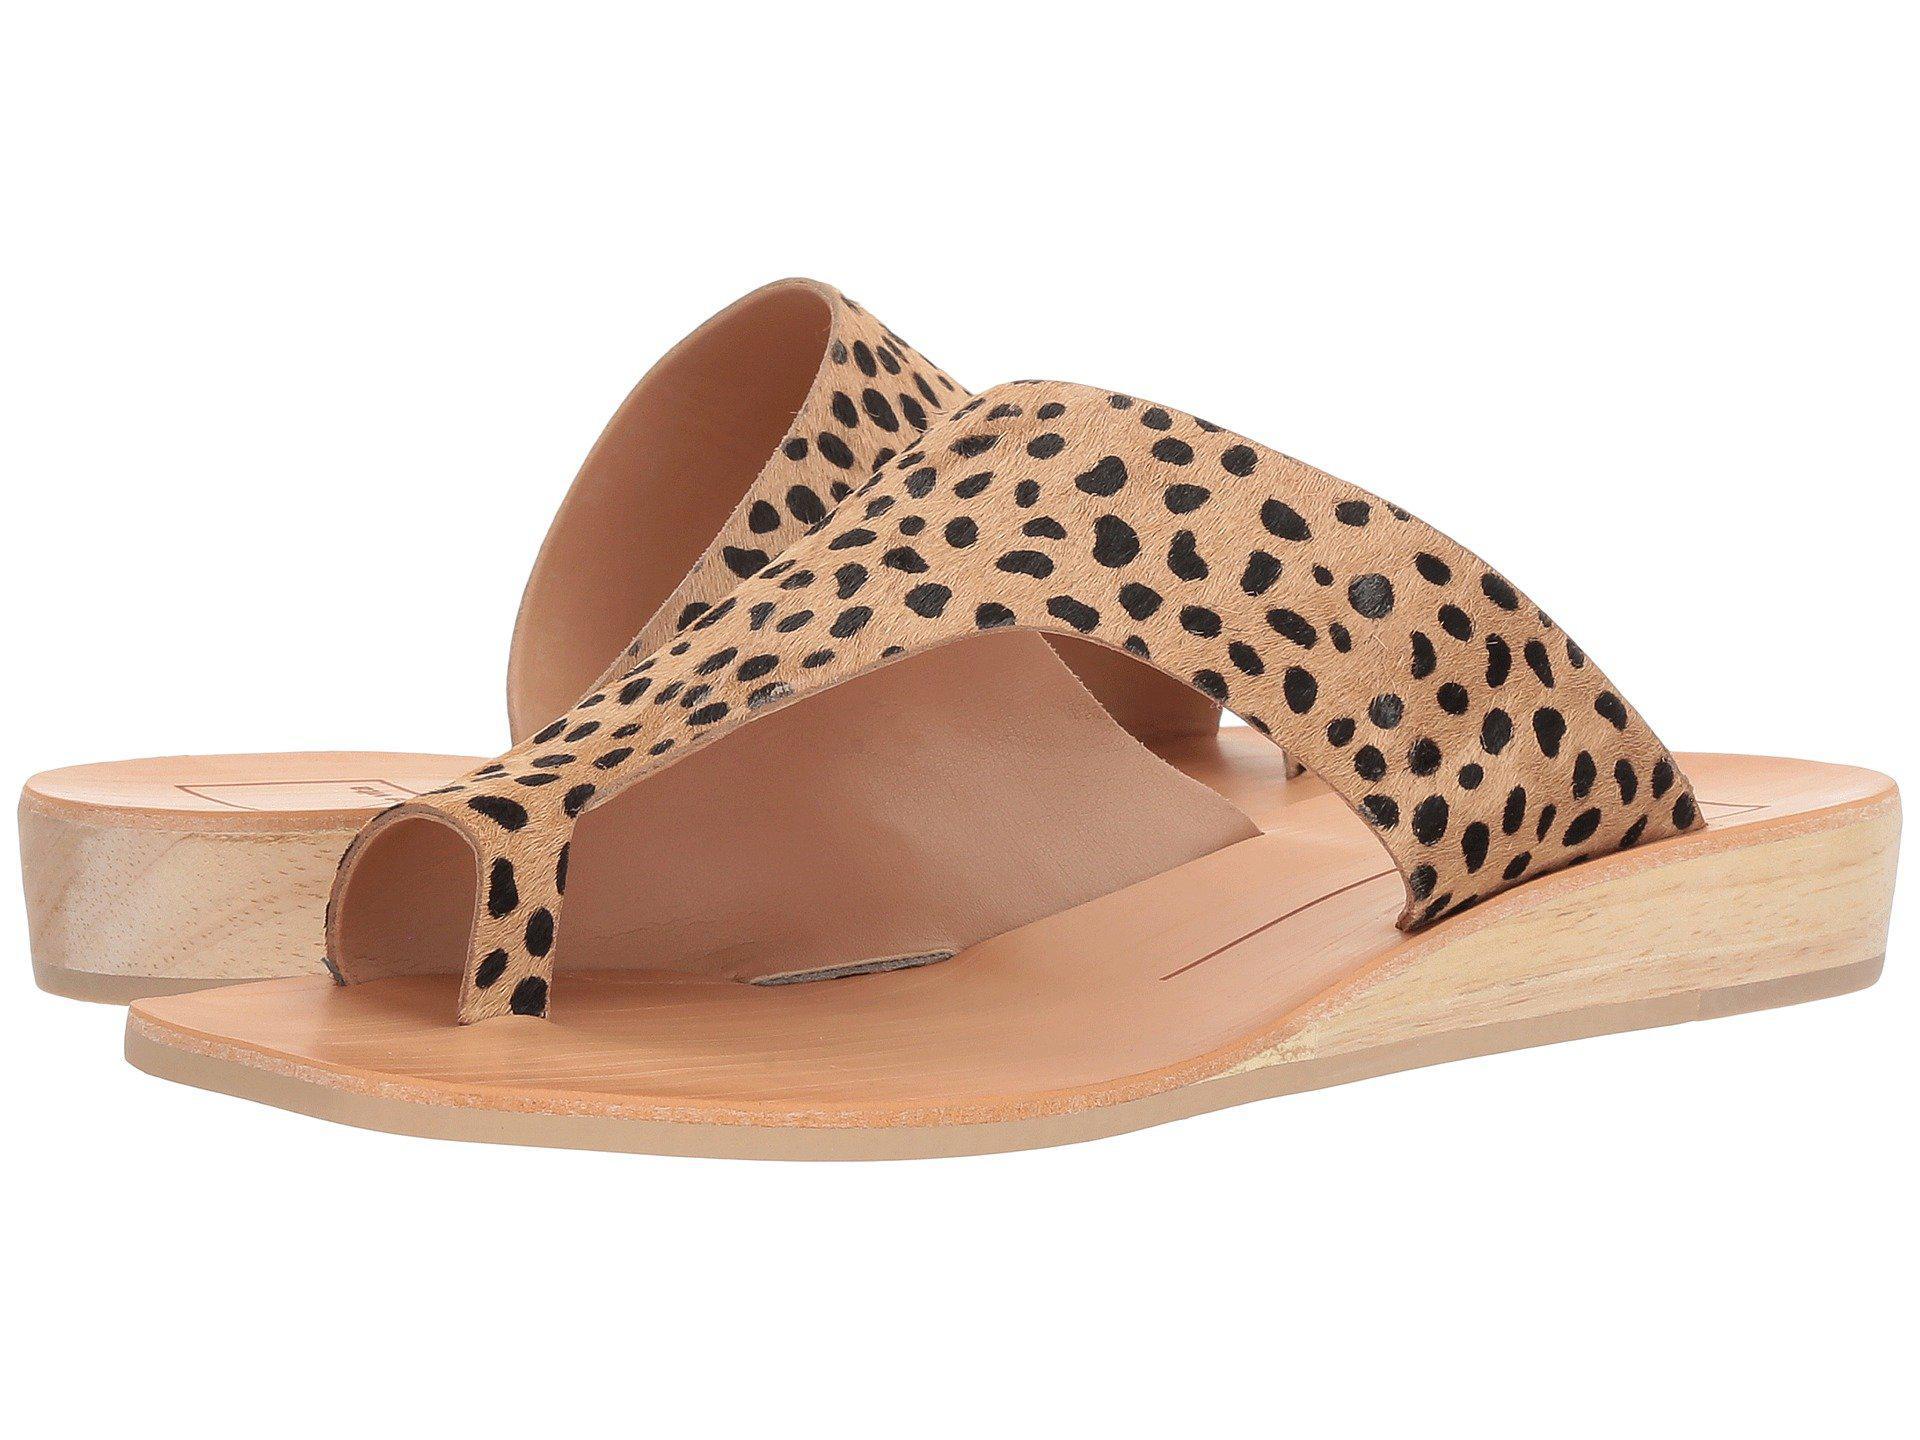 Dolce Vita Leather Hazle Slide Sandal Lyst